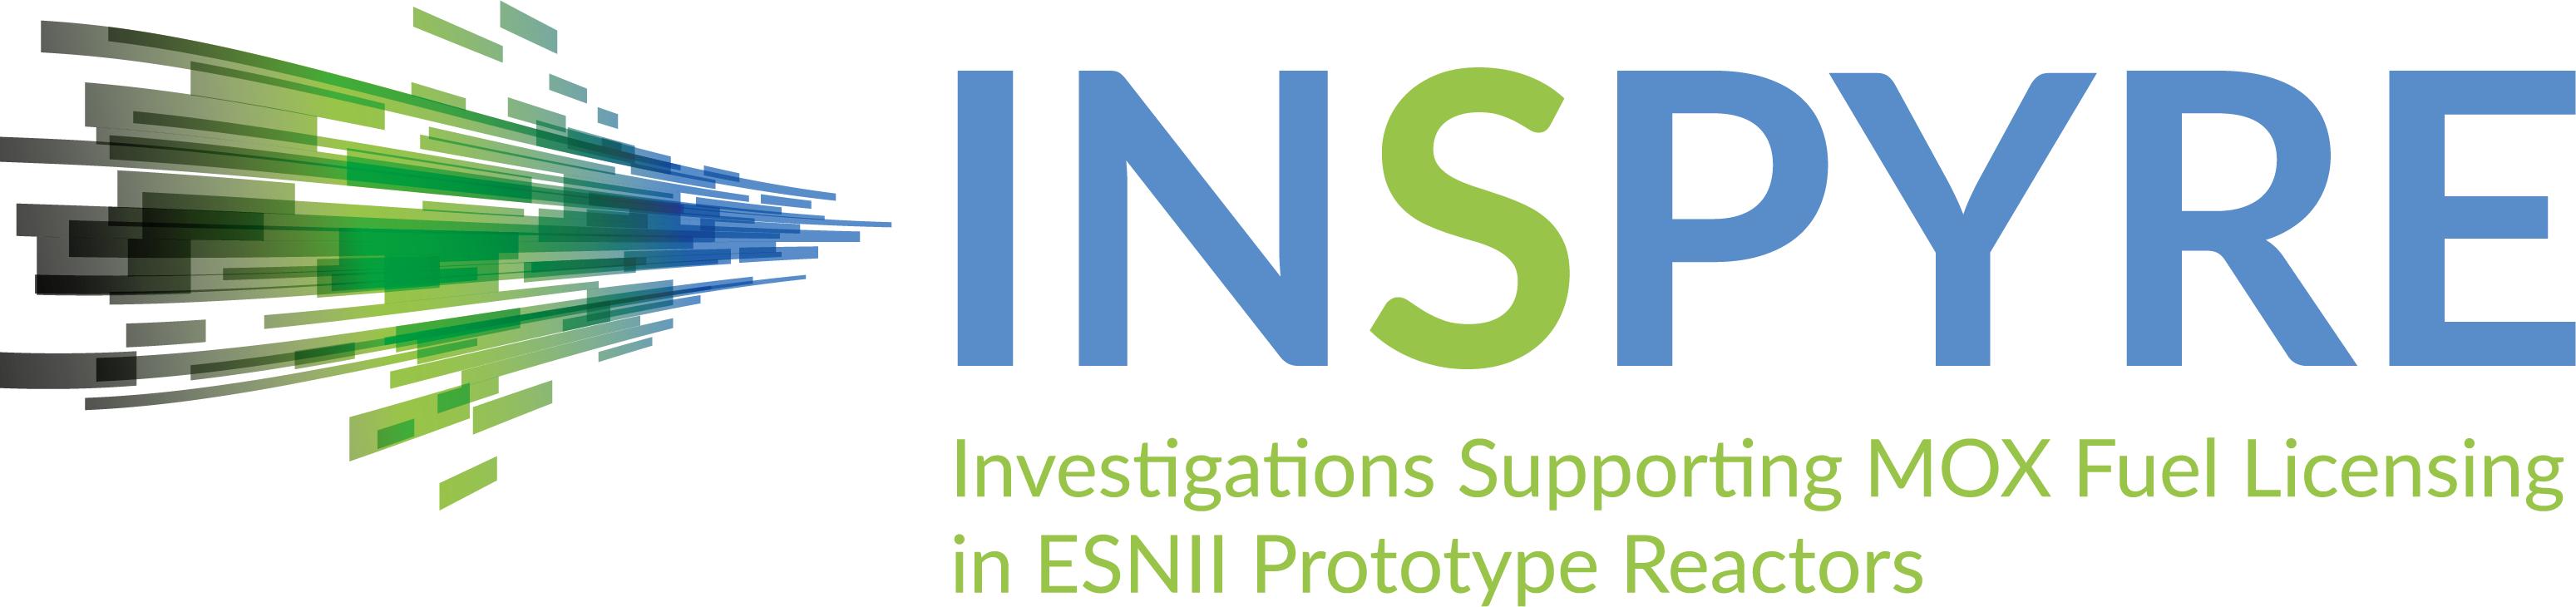 INSPYRE logo